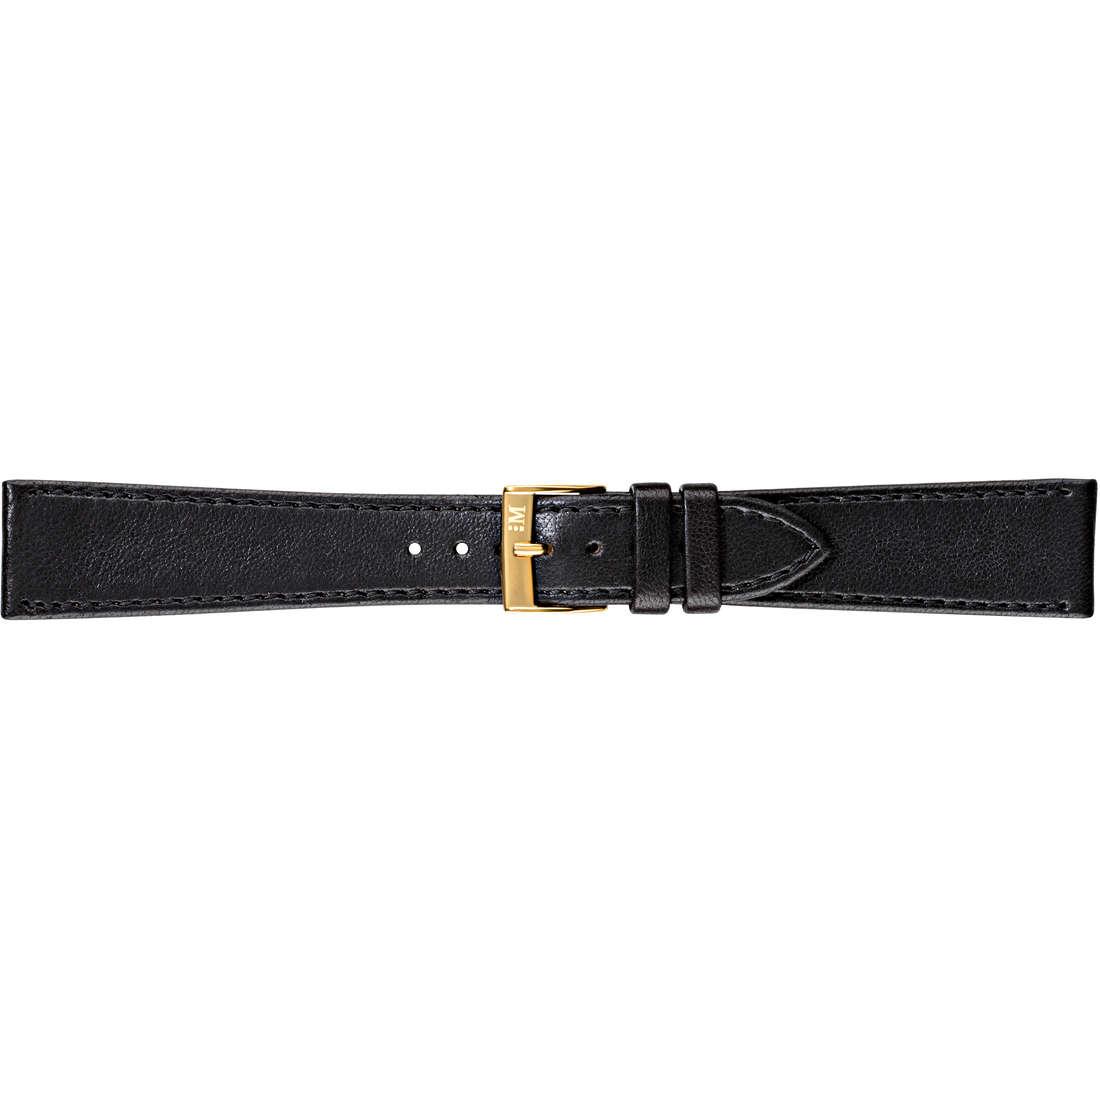 watch watch bands watch straps man Morellato Morellato 1930 A01U0770006019DO20